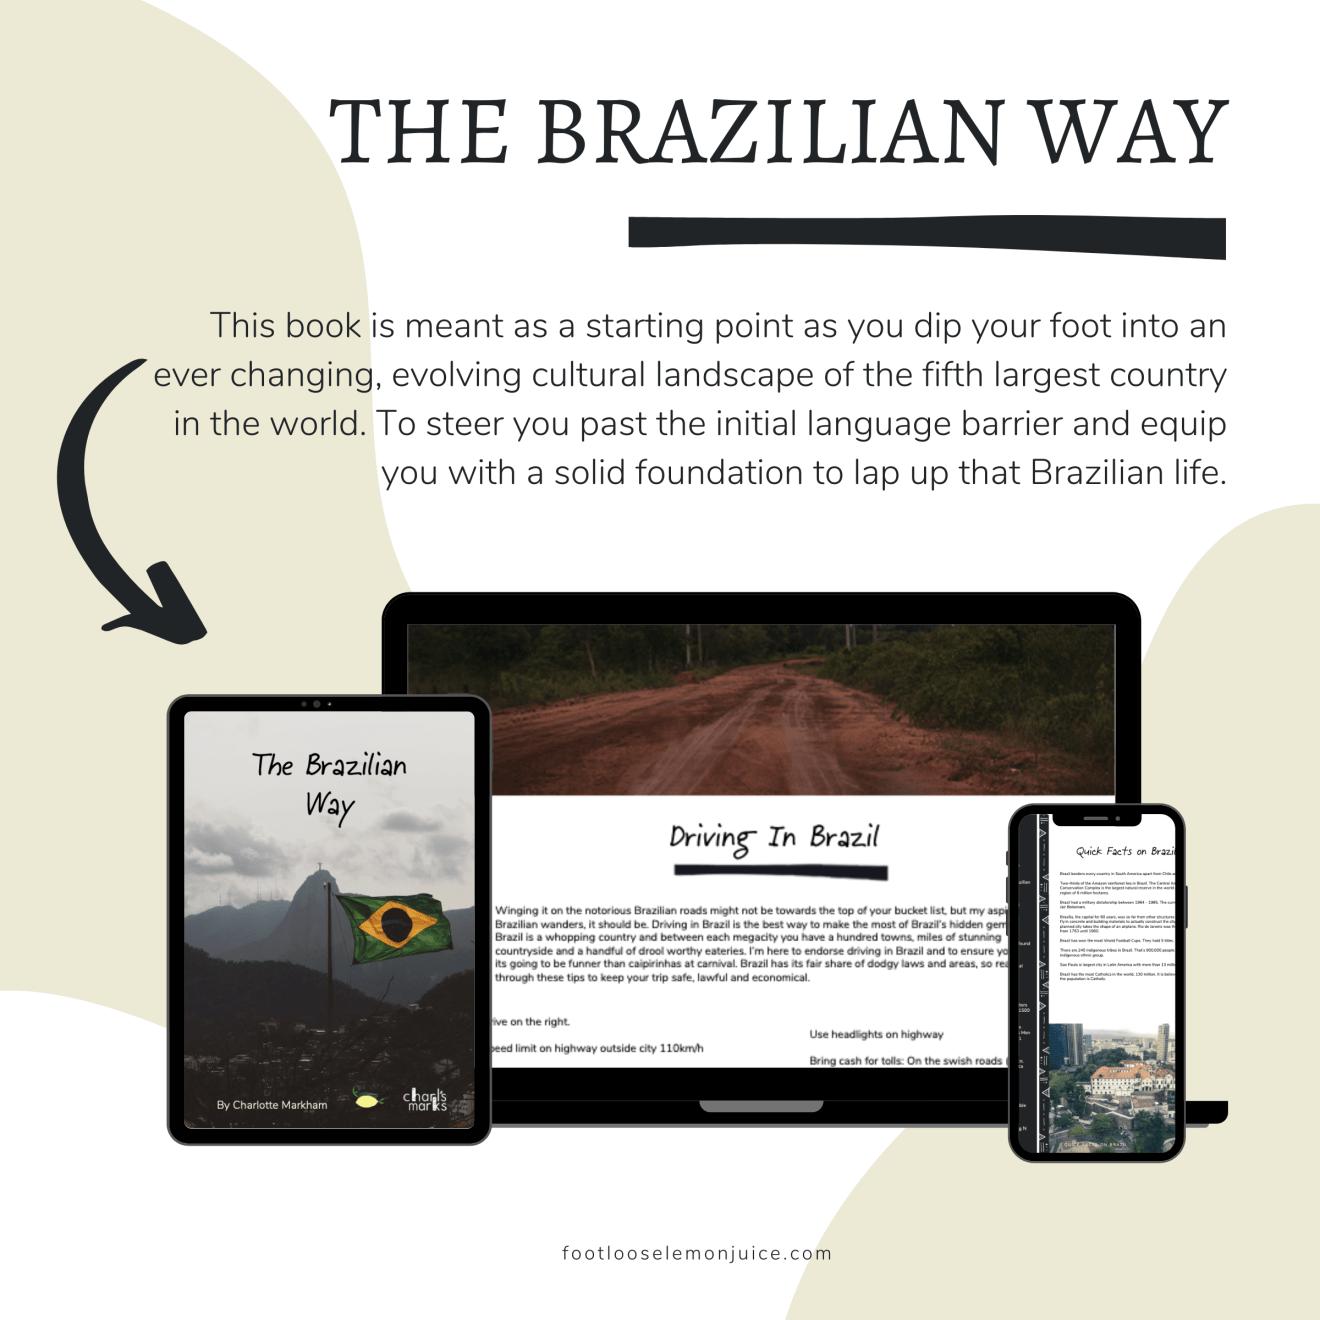 The Brazilian Way Book